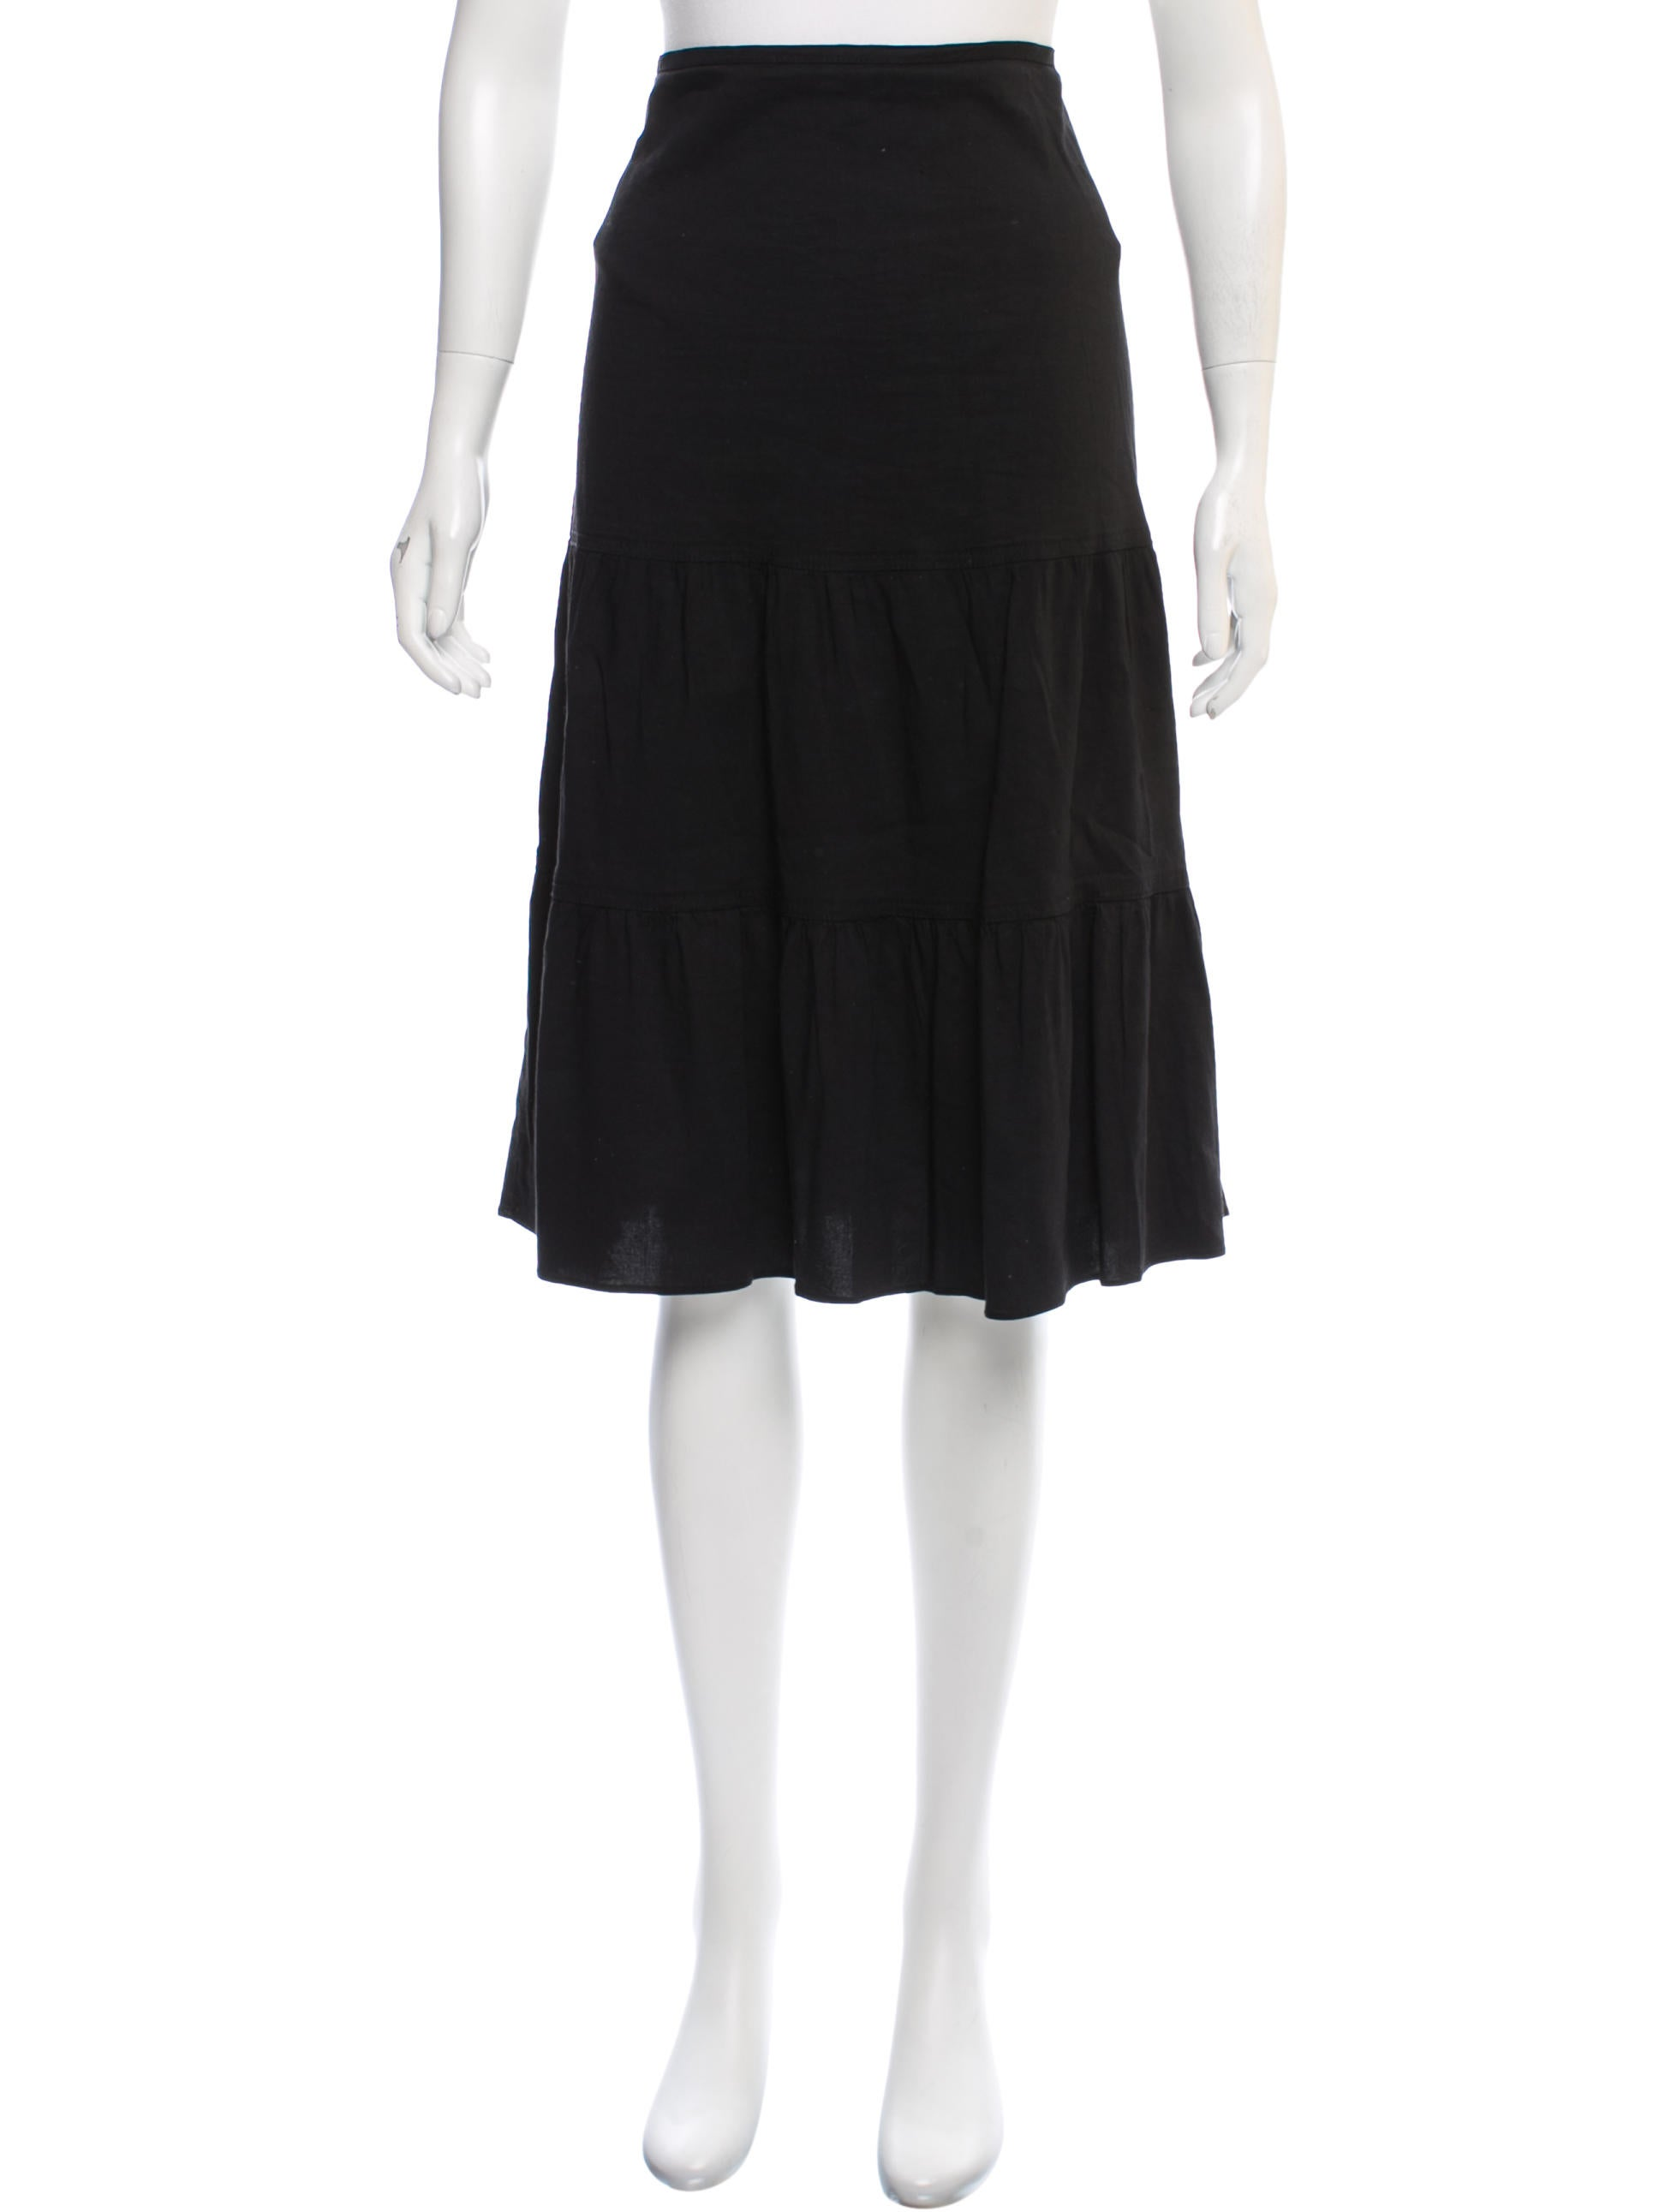 Theory Knee-Length Flounce Skirt Clearance Footlocker iRFRTb5SRx